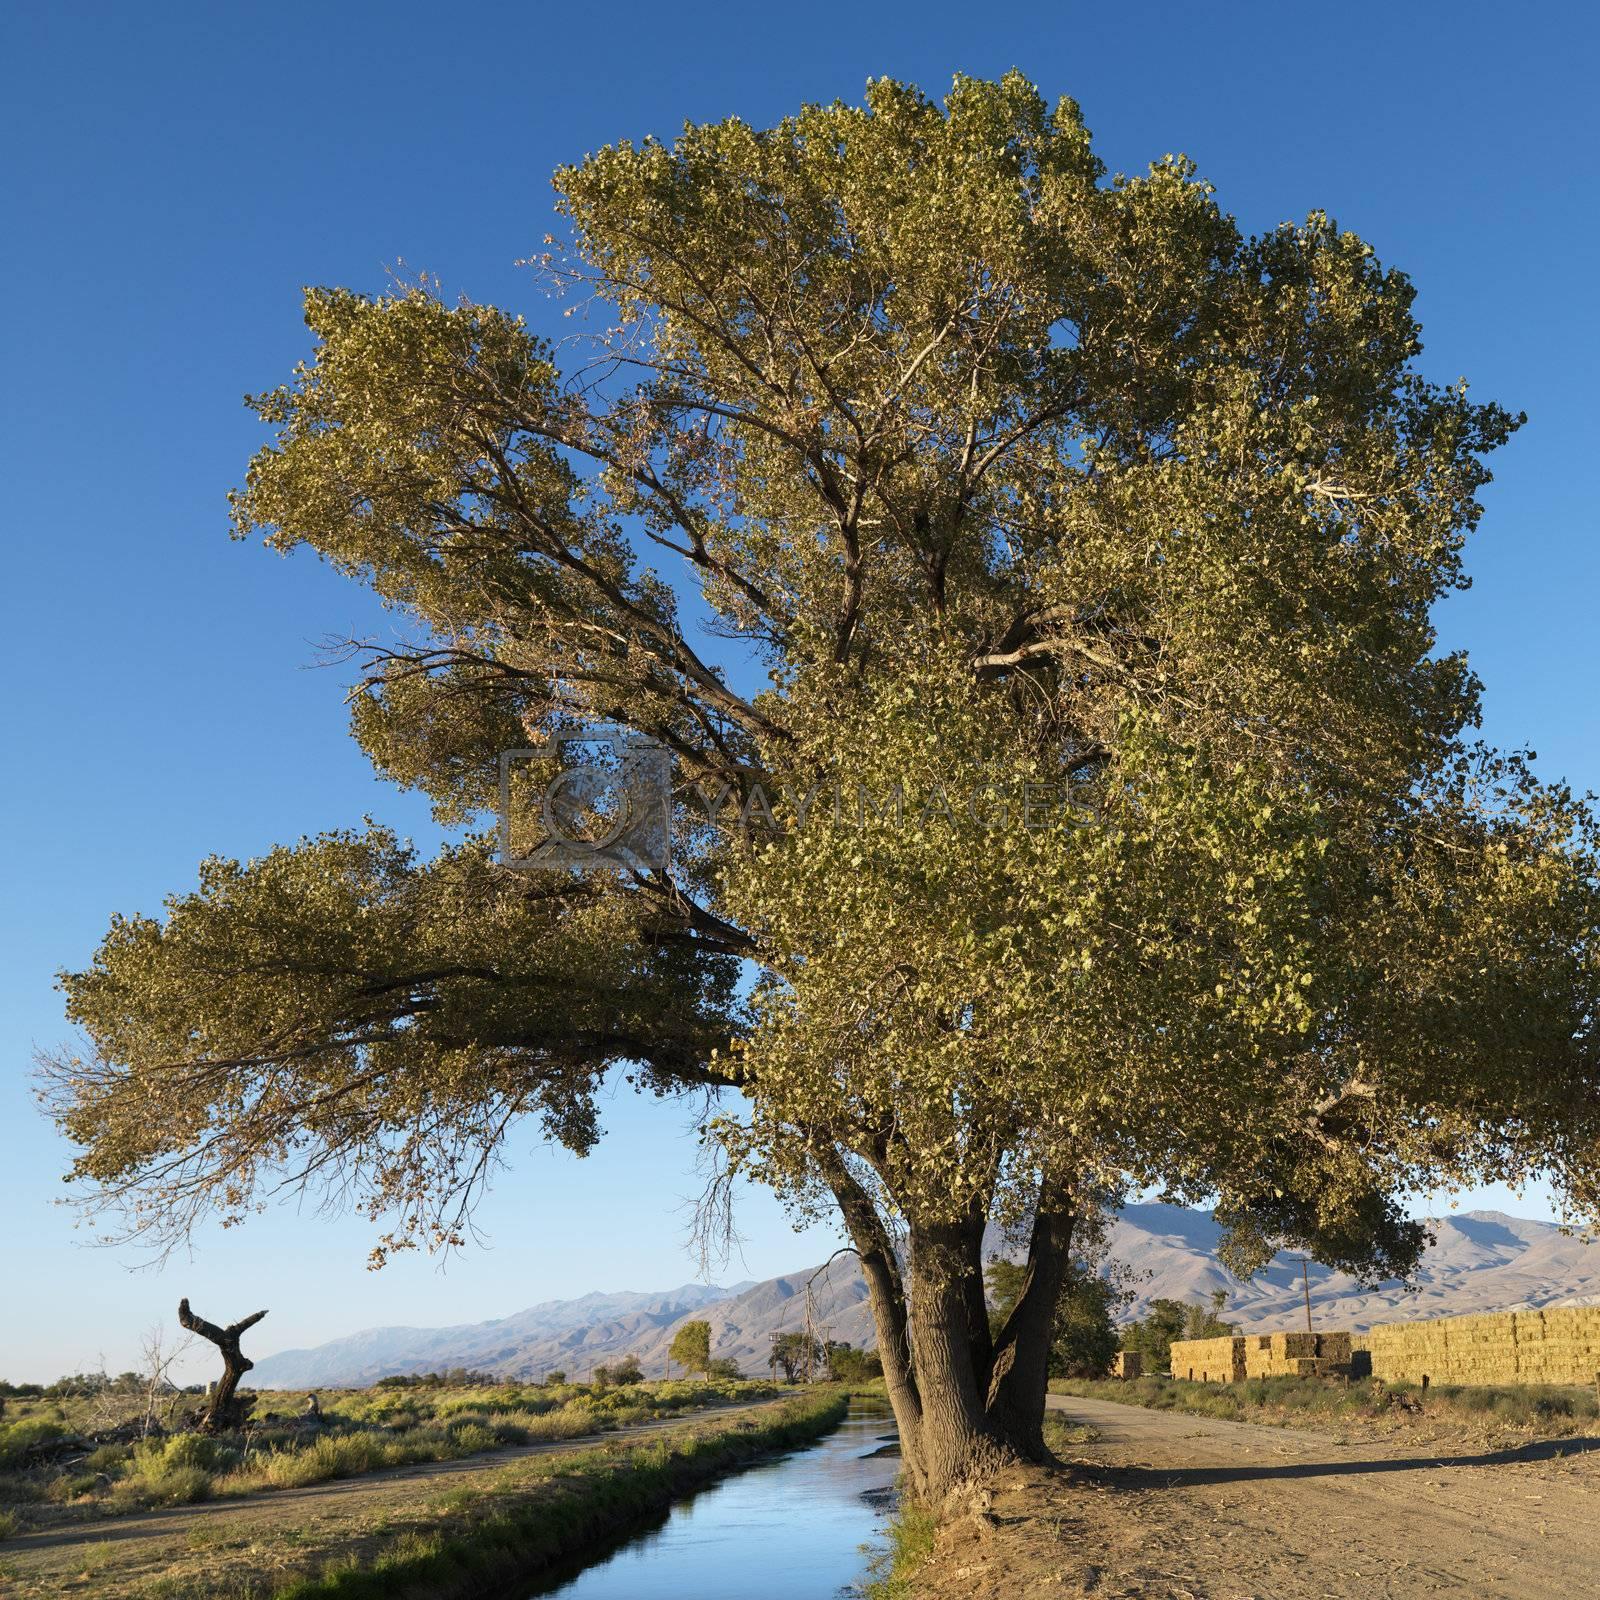 Tree by creek. by iofoto